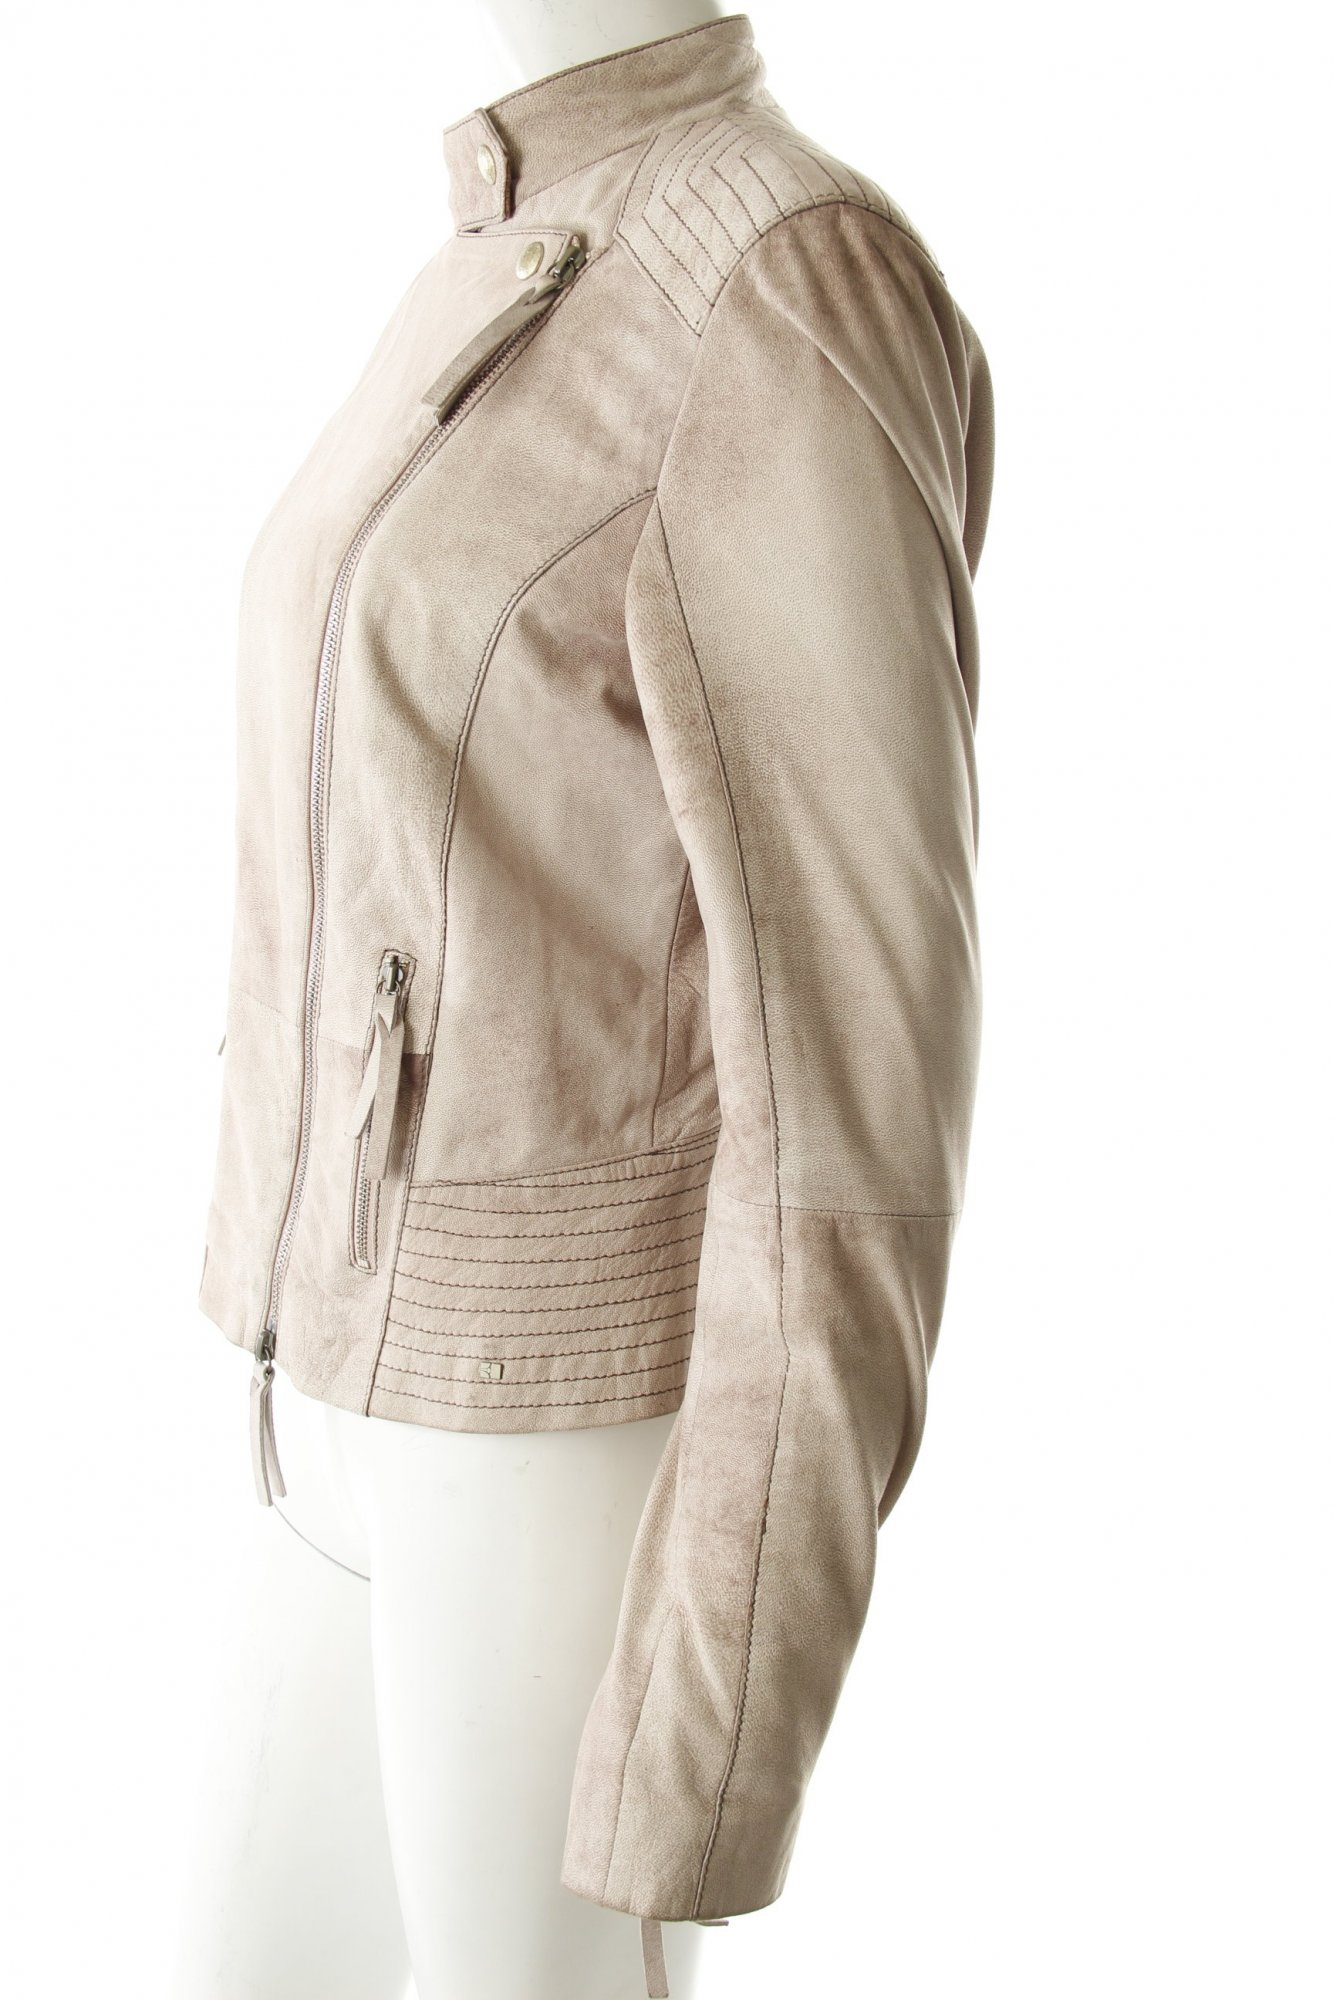 HUGO-BOSS-Leather-Jacket-beige-Band-ornaments-Women-s-Size-UK-10